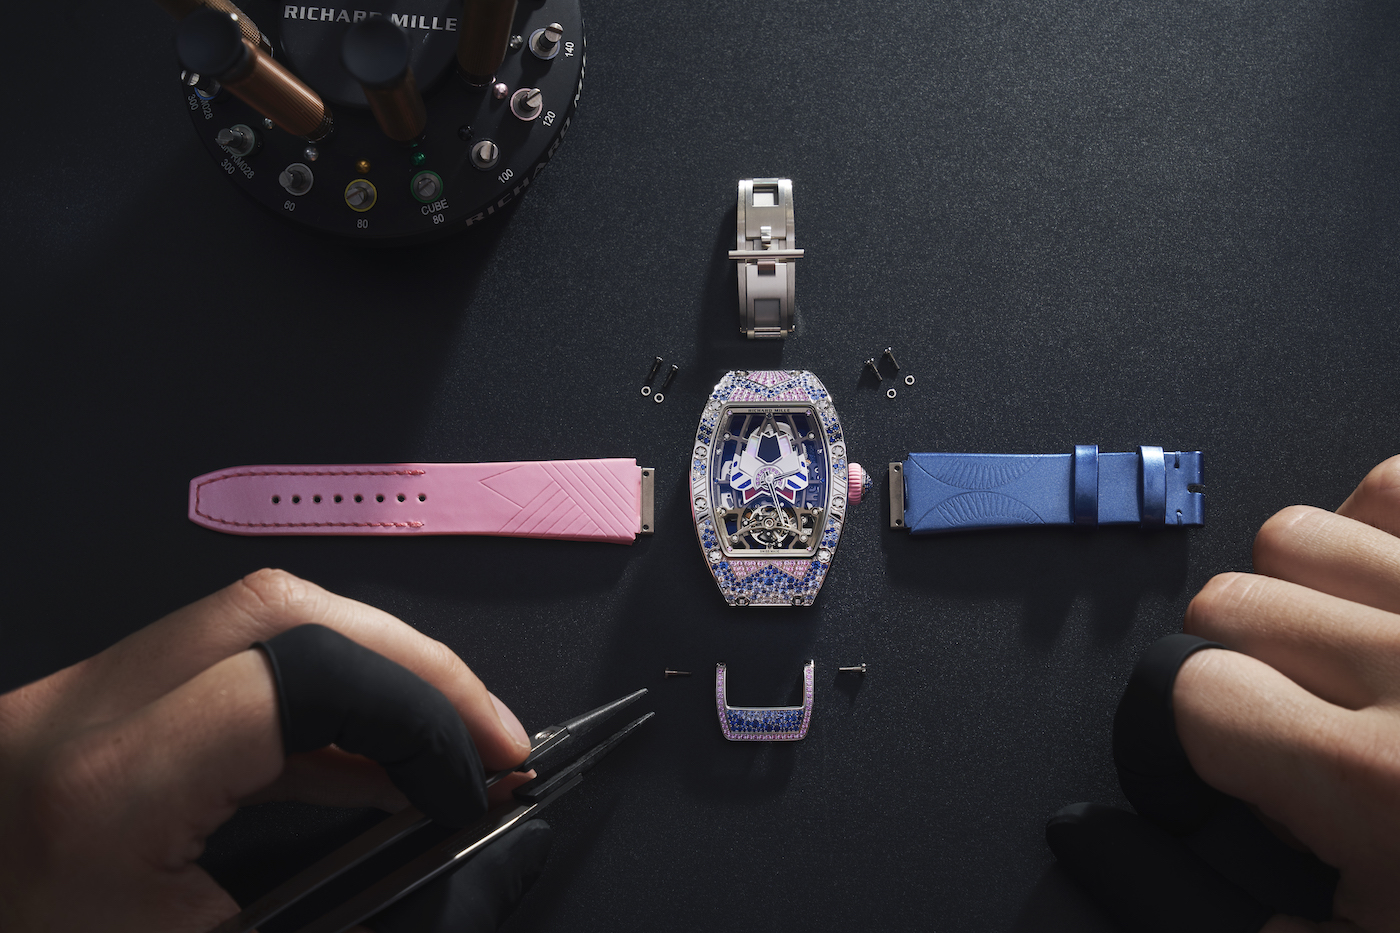 Richard Mille: breakthrough in jewellery watchmaking